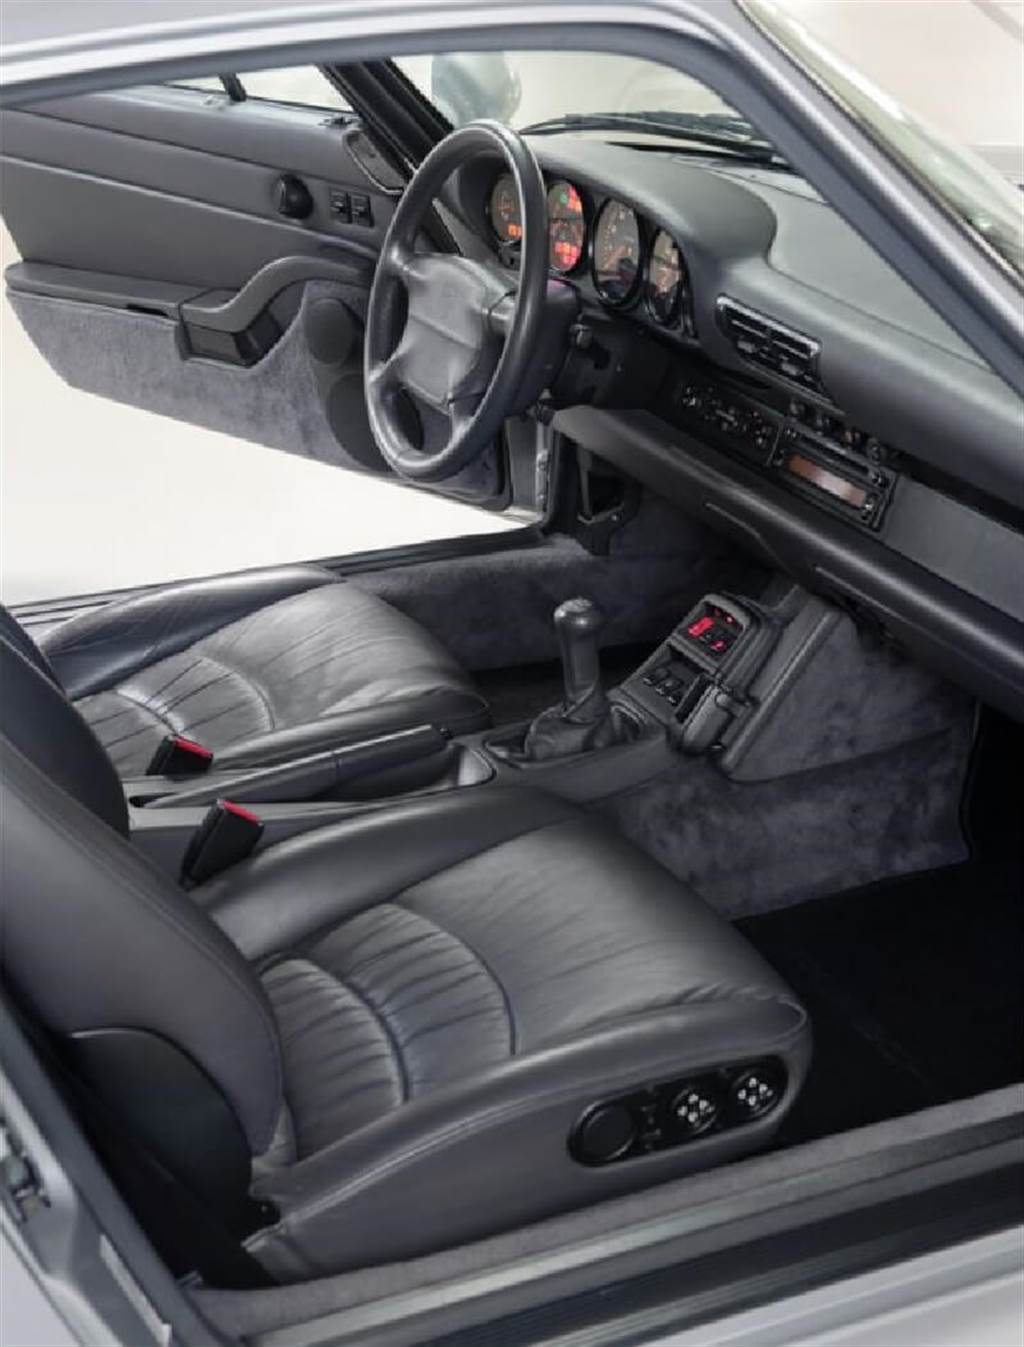 Porsche末代氣冷993世代911 Turbo來自959技術概念的傳承